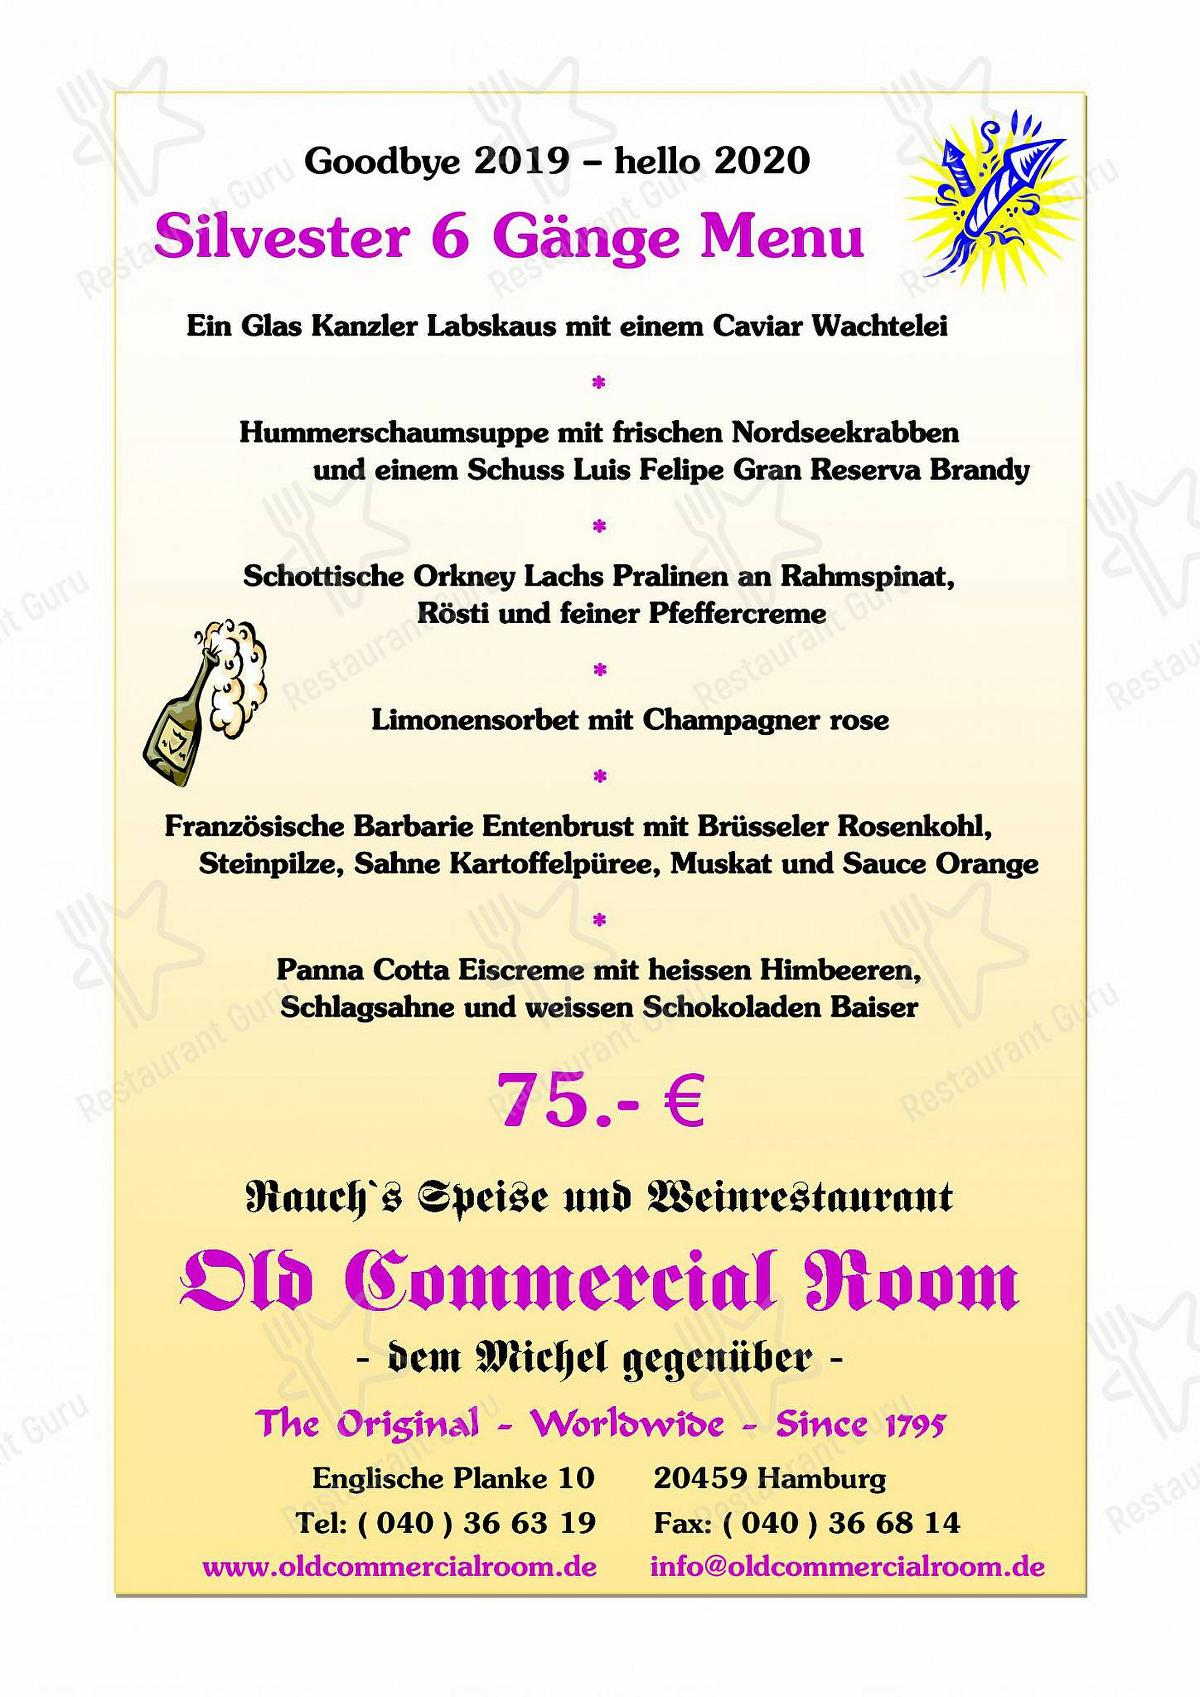 Speisekarte von Old Commercial Room restaurant